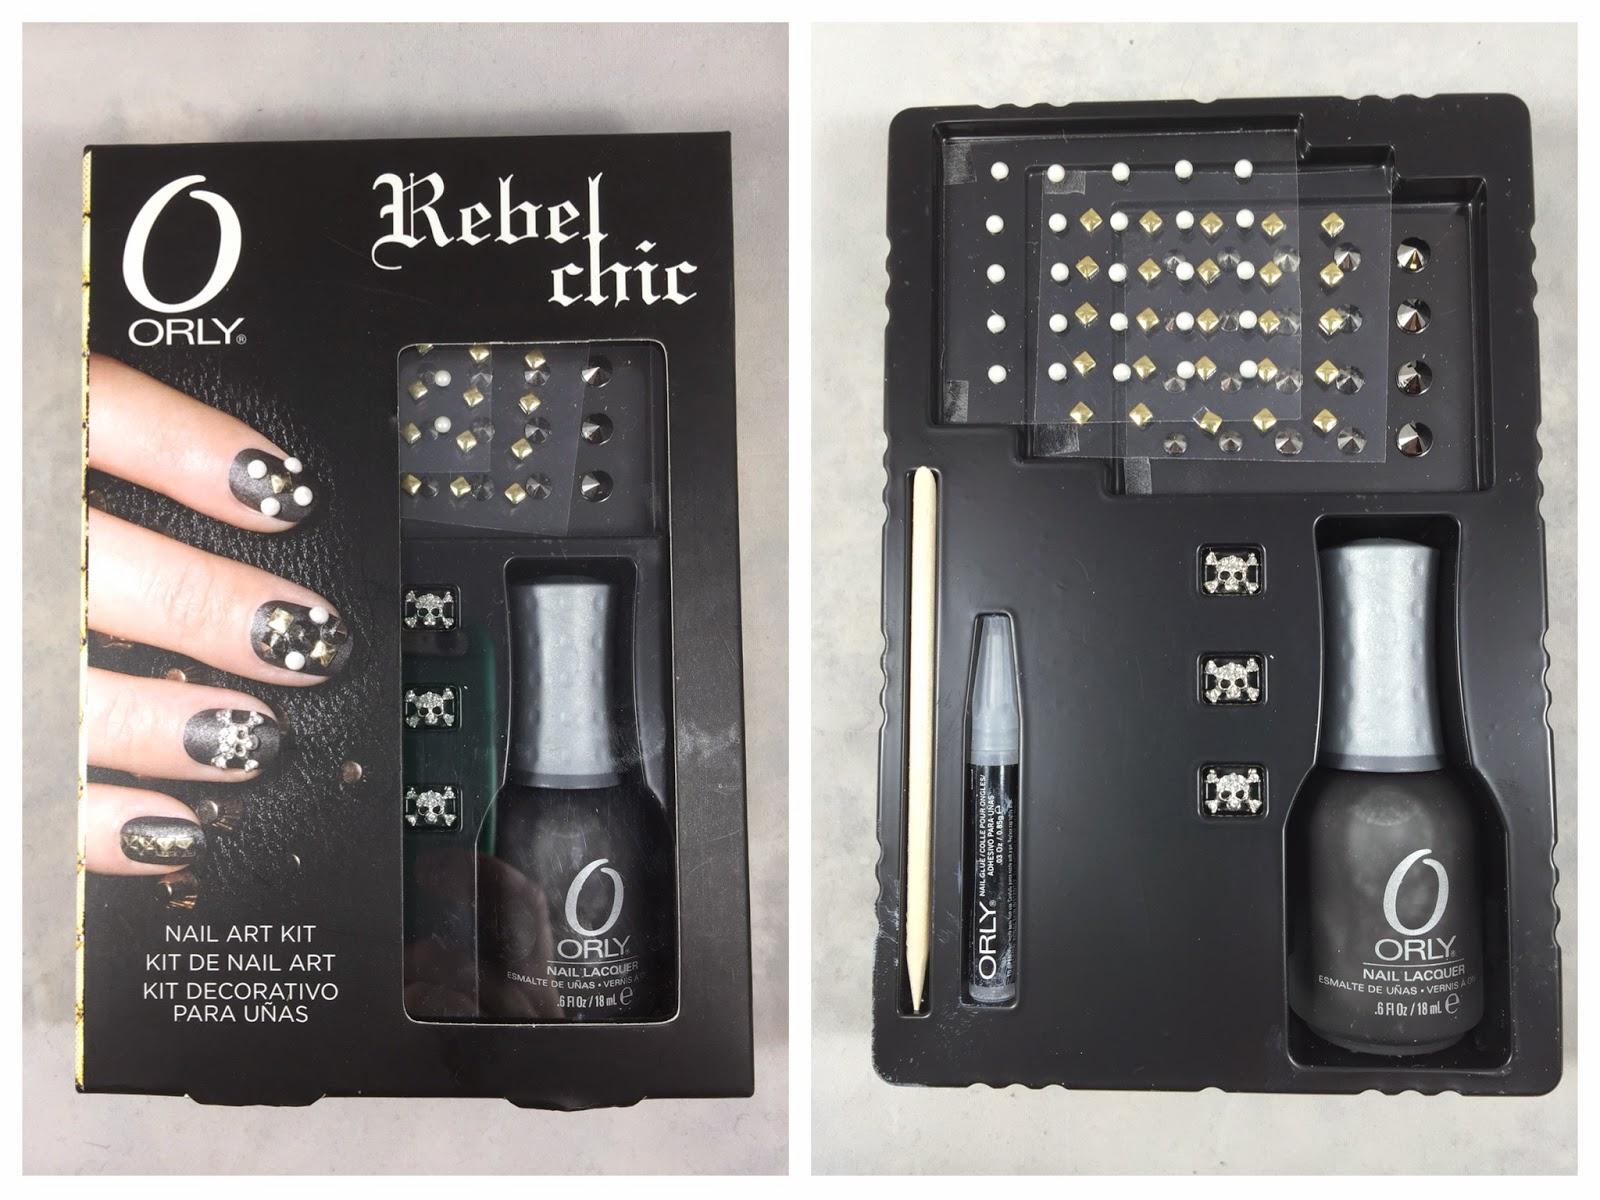 Nails Art: Orly Rebel Chic Gift Set